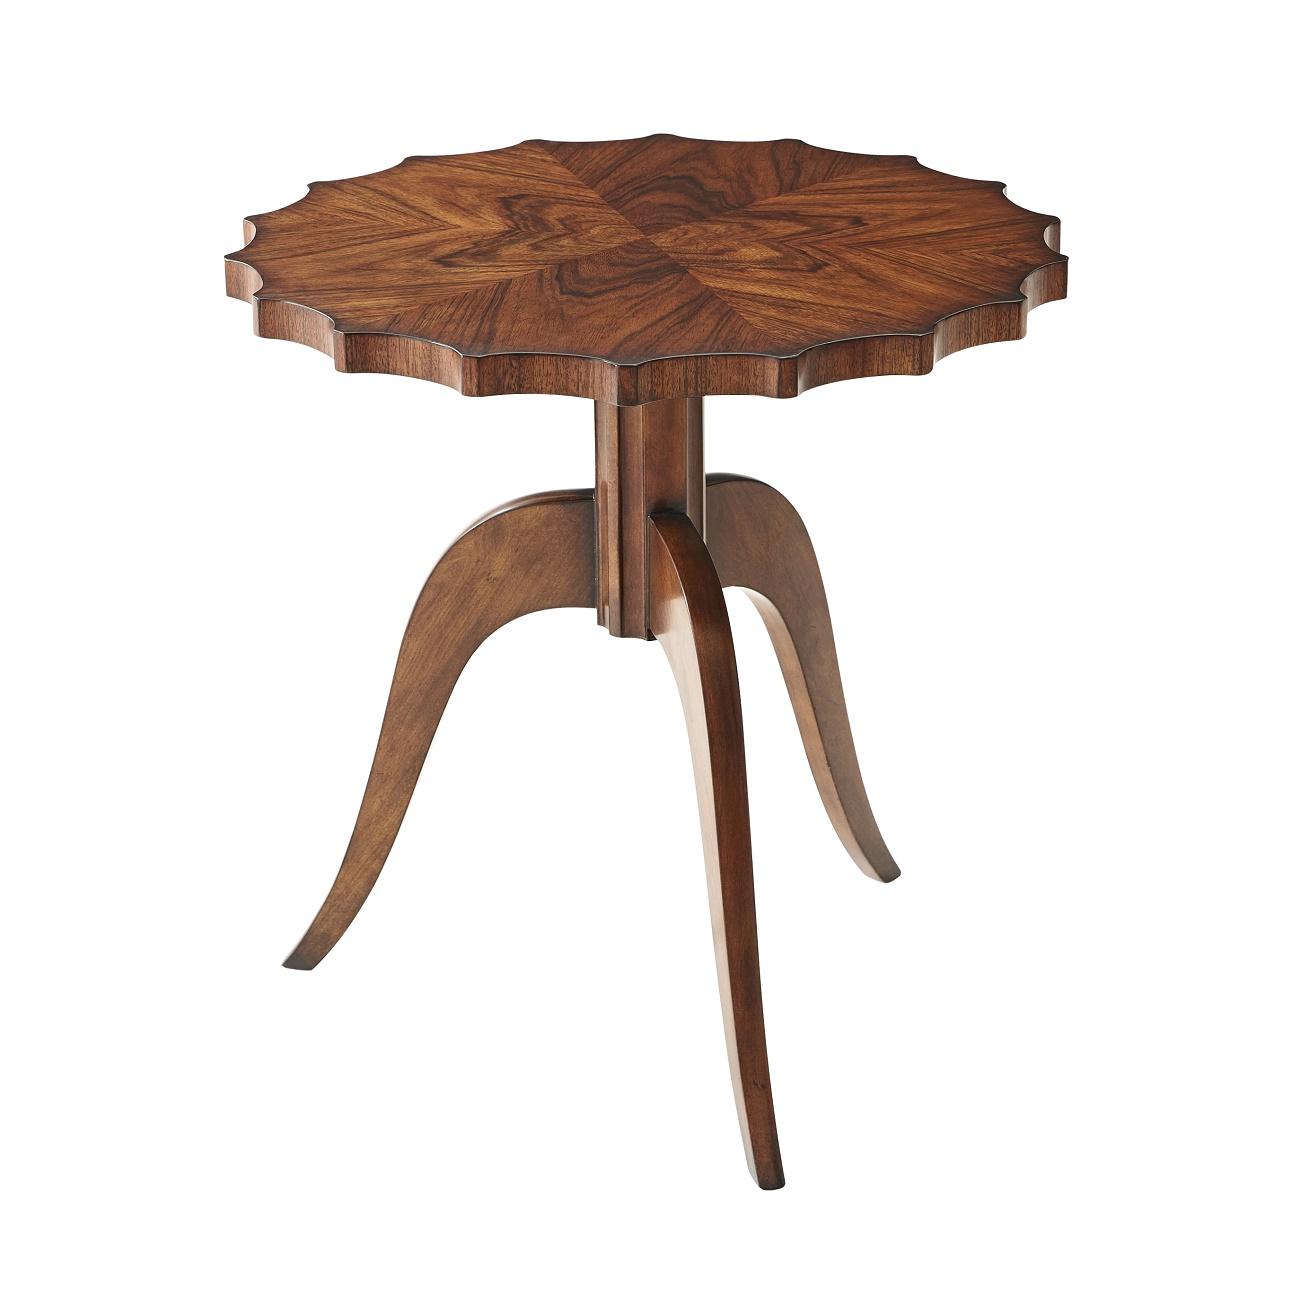 5005 607 Eclectics Modern Piecrust Accent Table theodore alexander